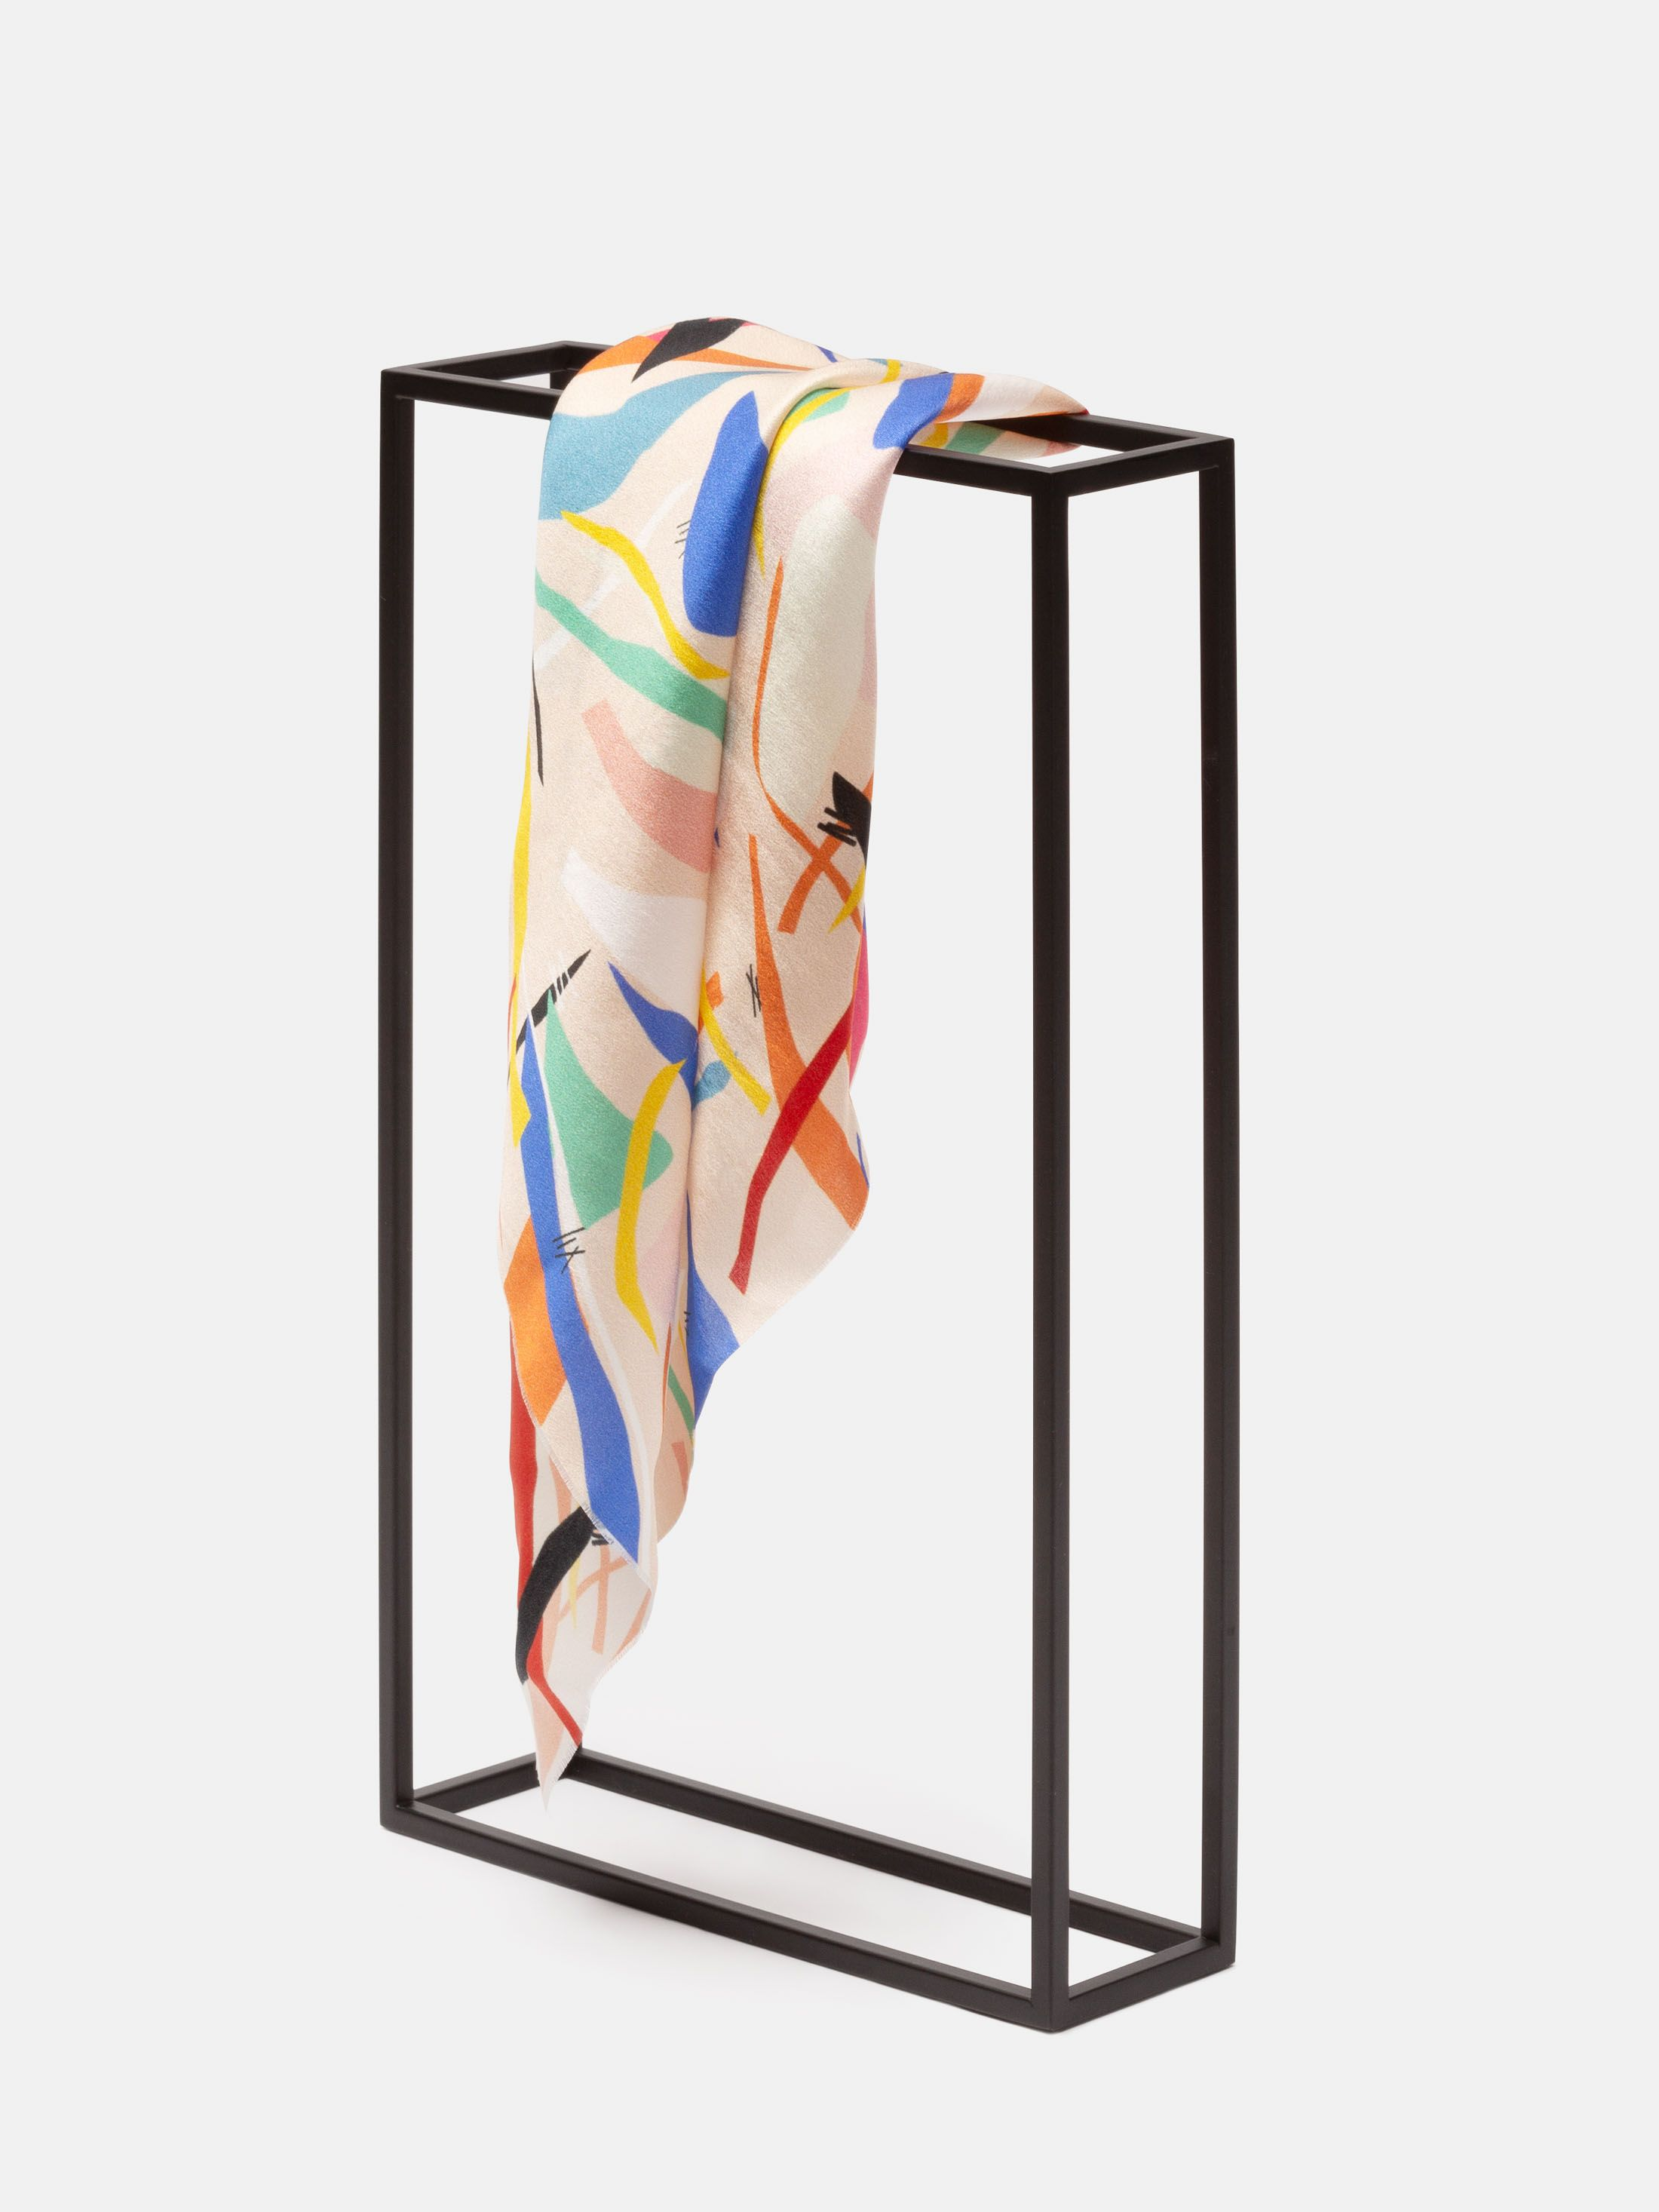 digital printing personalise silk satin fabric